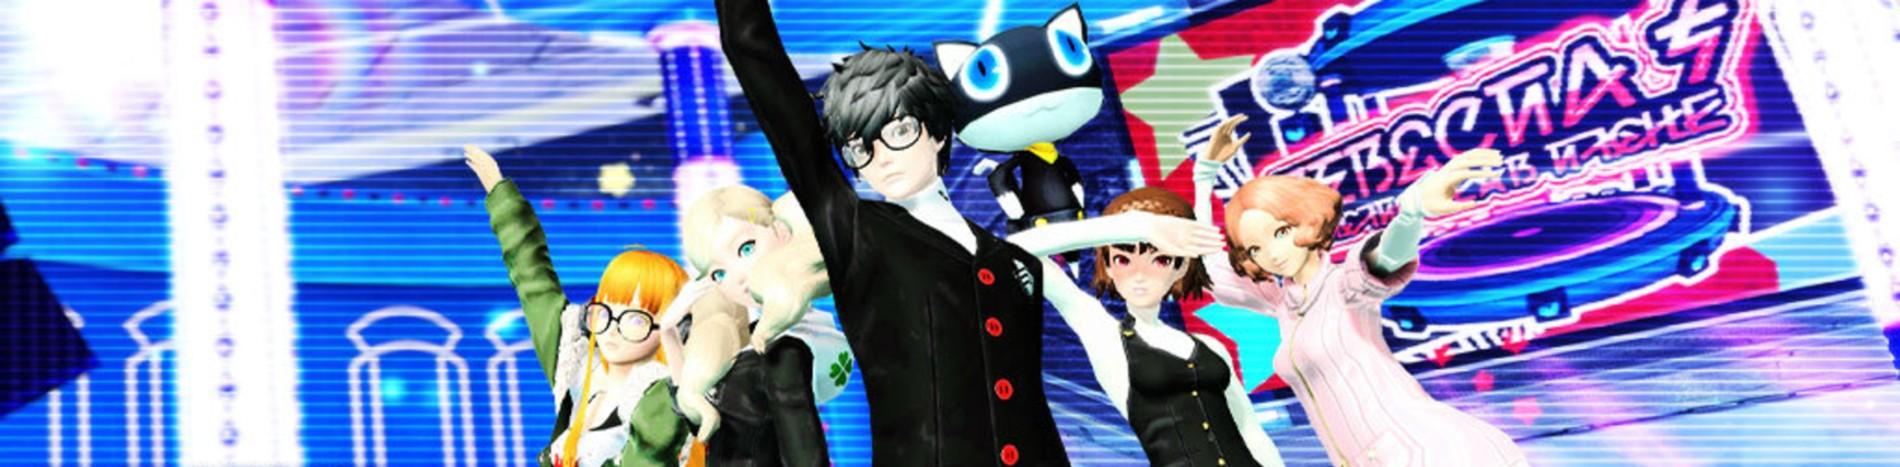 Persona is invading Phantasy Star Online 2 screenshot